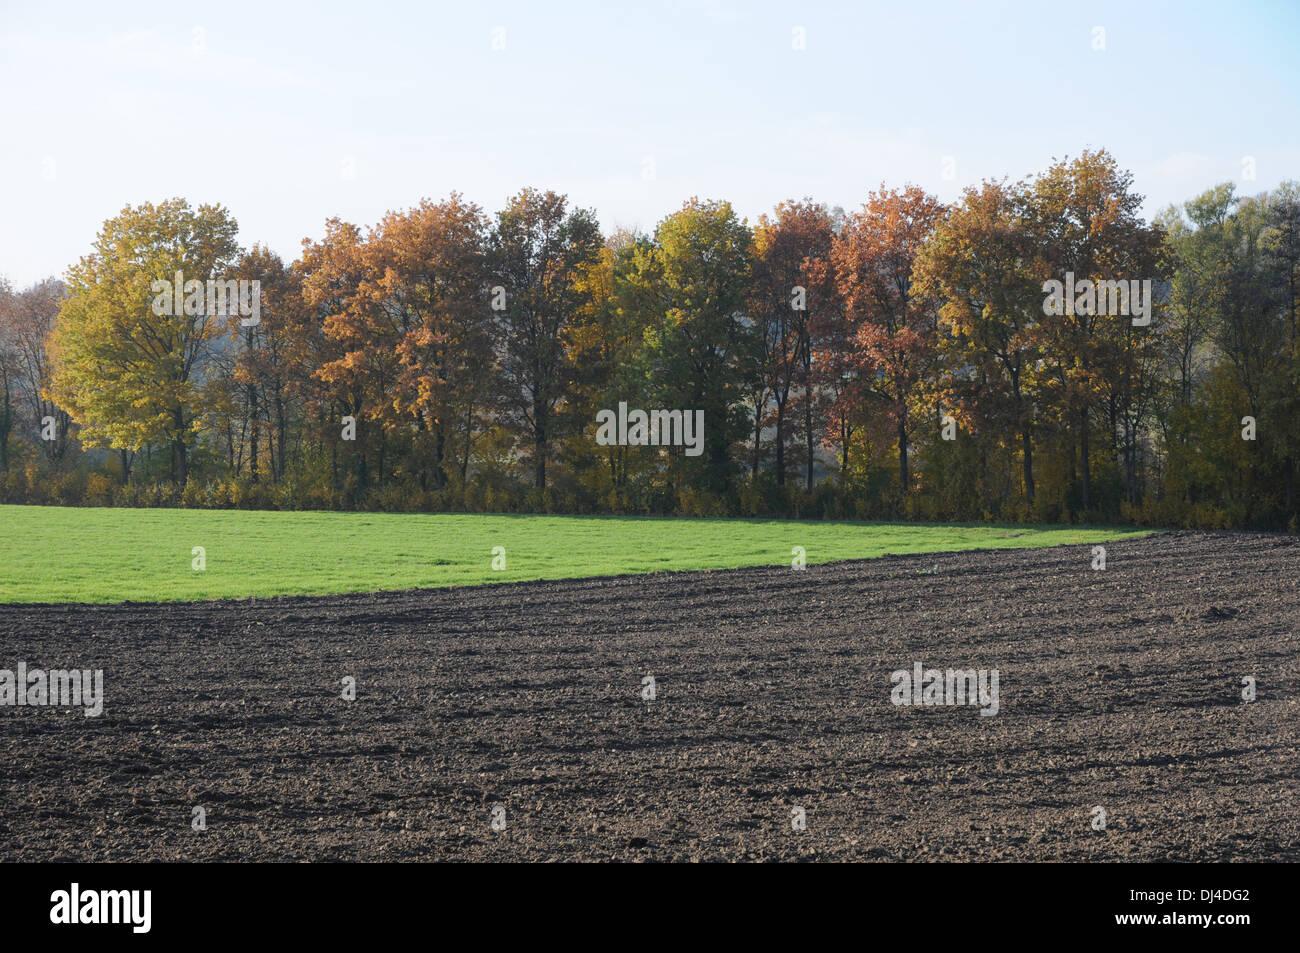 Field - Stock Image